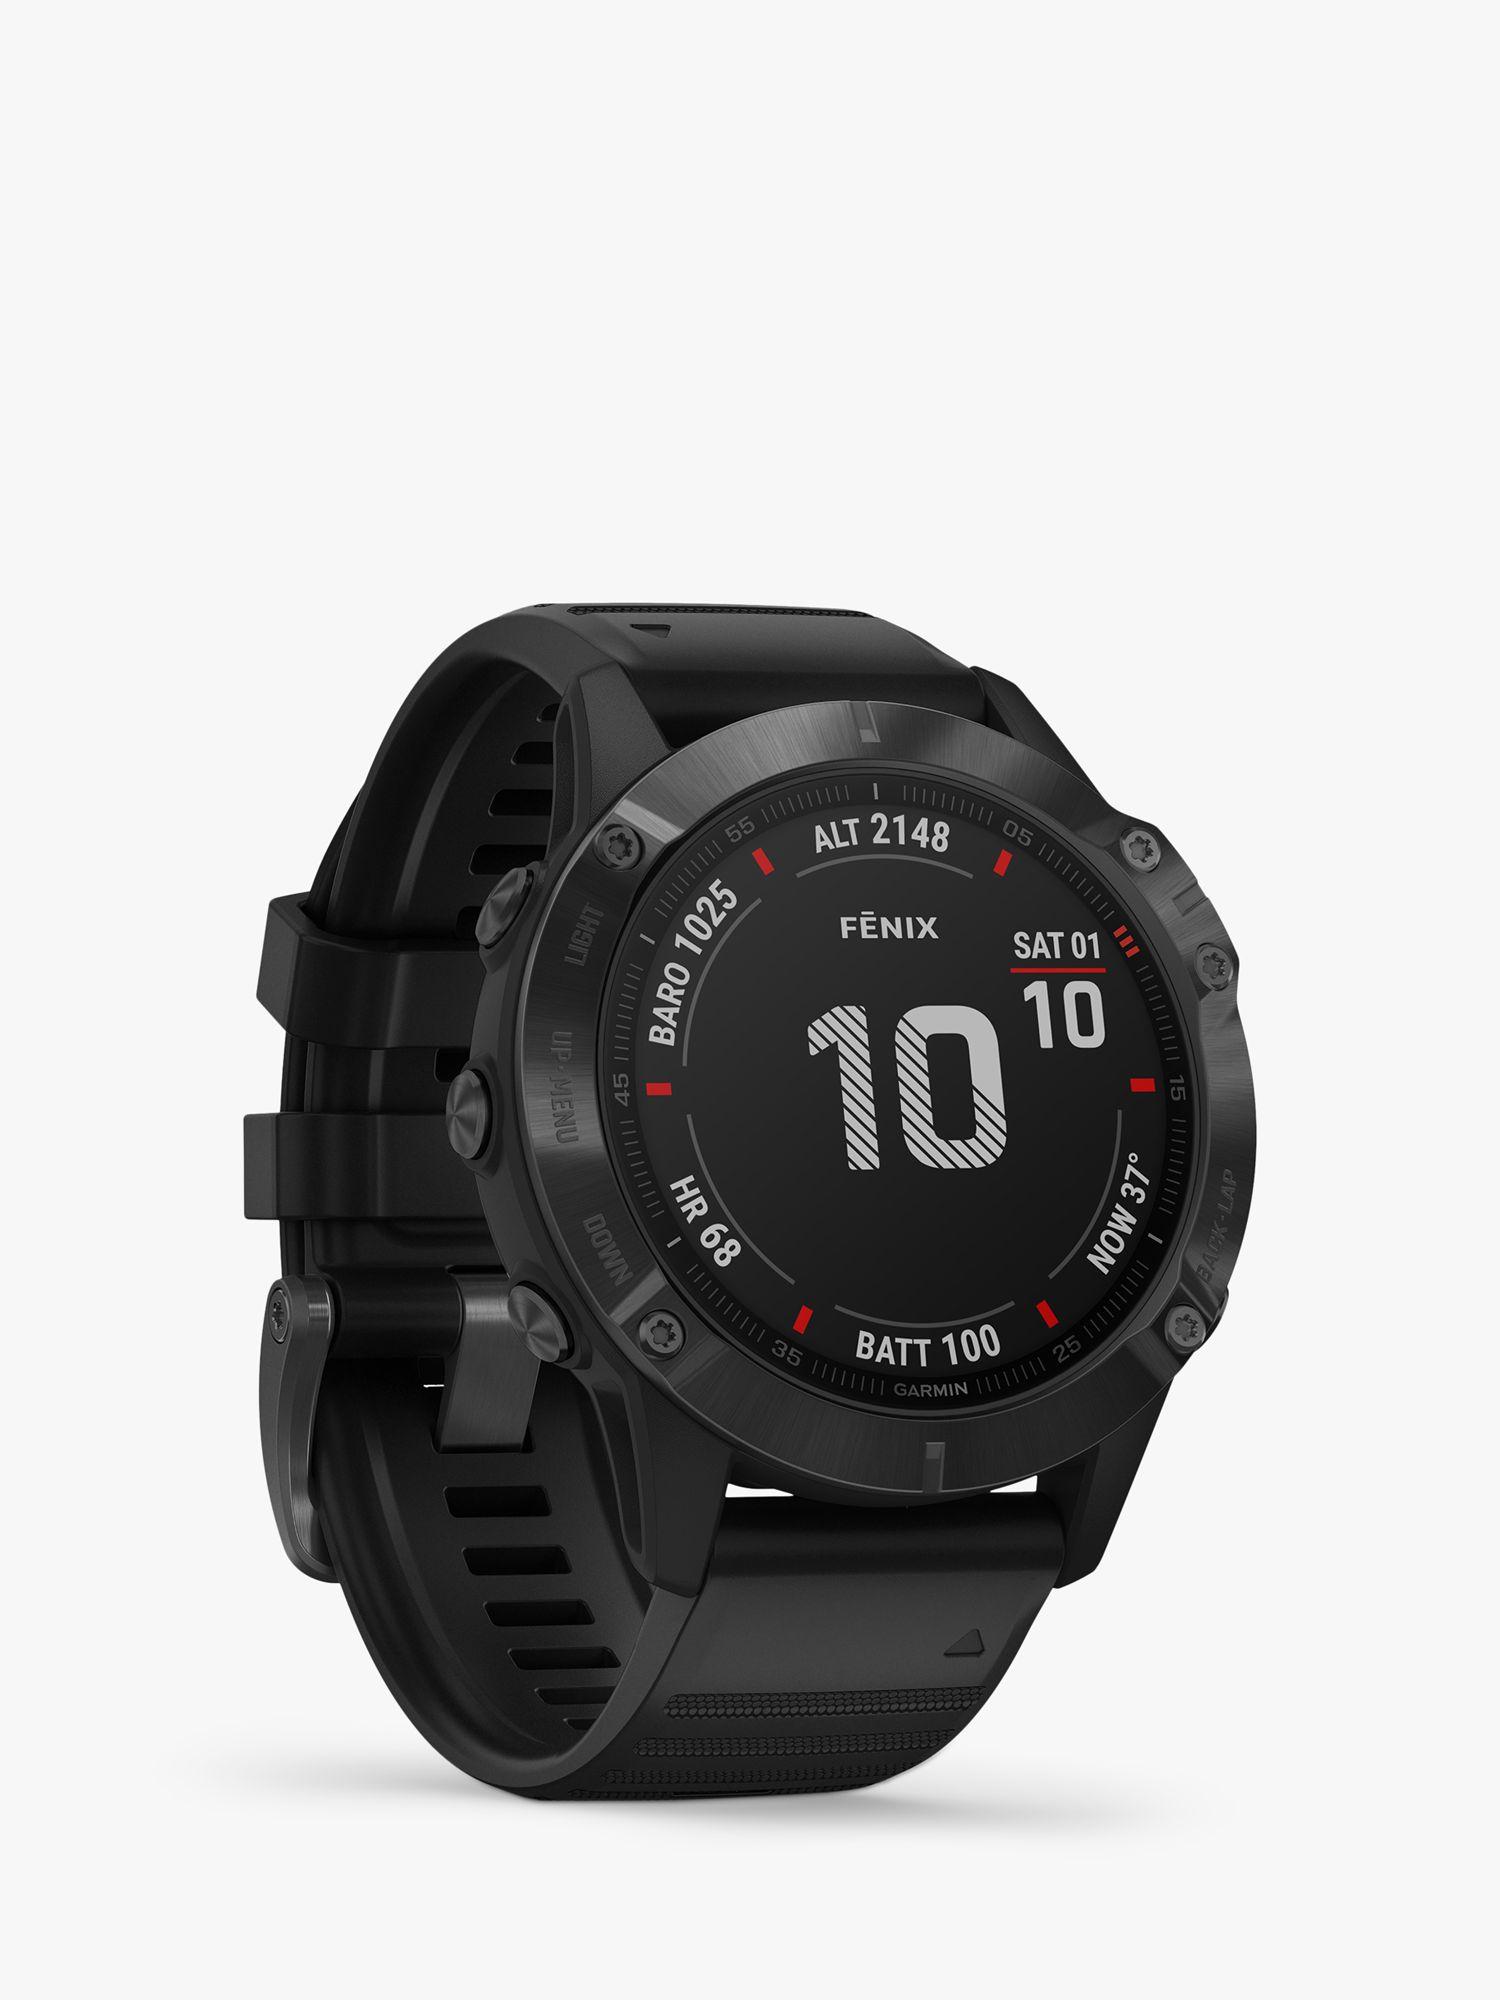 Garmin Garmin fēnix 6 Pro GPS, 47mm, Multisport Watch, Black